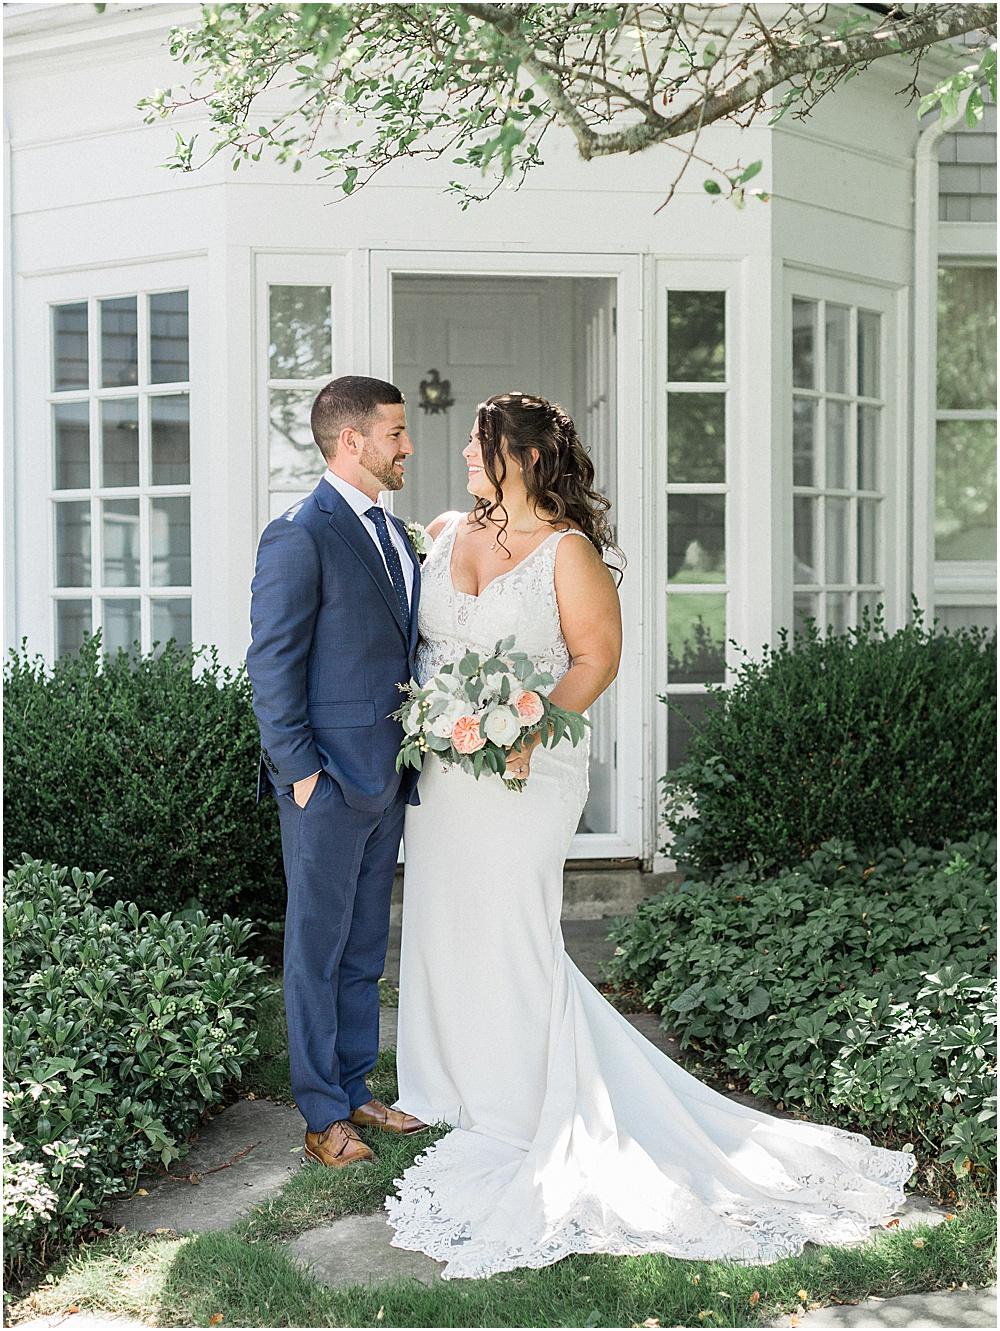 tabor_academy_rebecca_chris_tented_interior_trees_engagement_session_cape_cod_massachusetts_boston_wedding_photographer_meredith_jane_photography_photo_0697.jpg